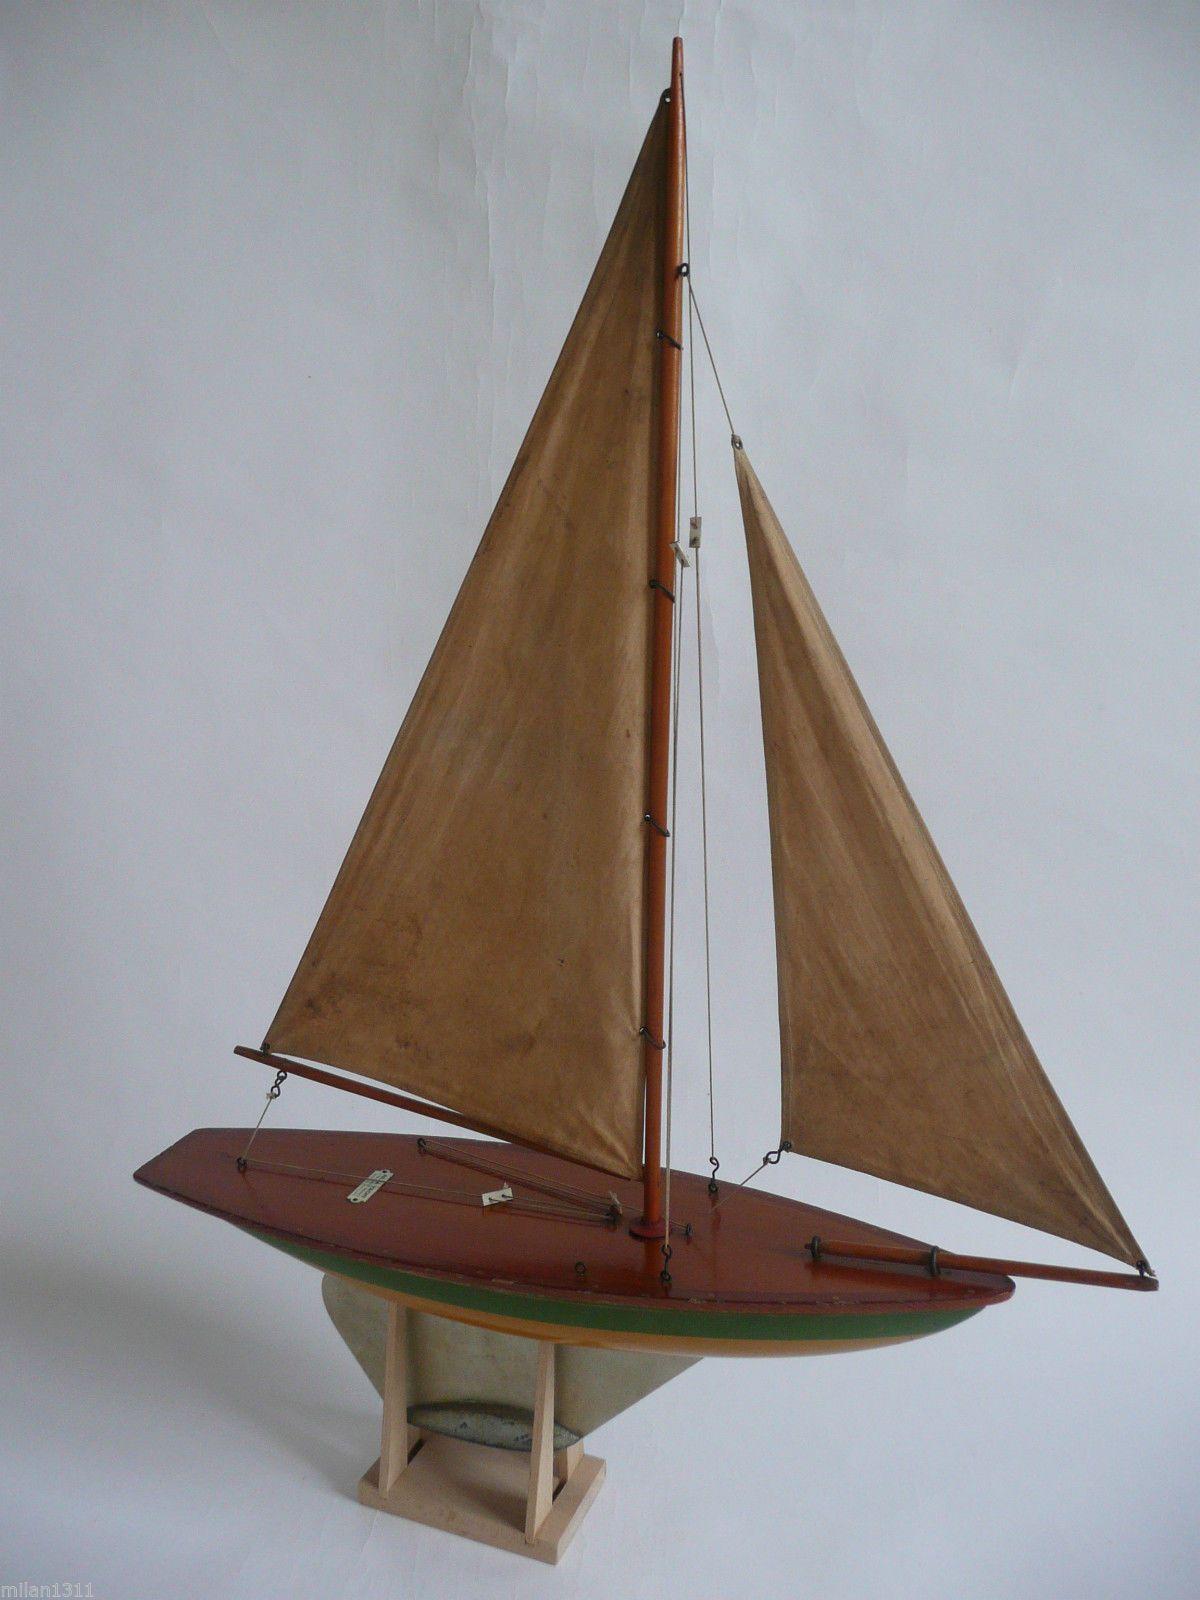 voilier de bassin ailsa yacht a  u0026quot milbro u0026quot  product made in